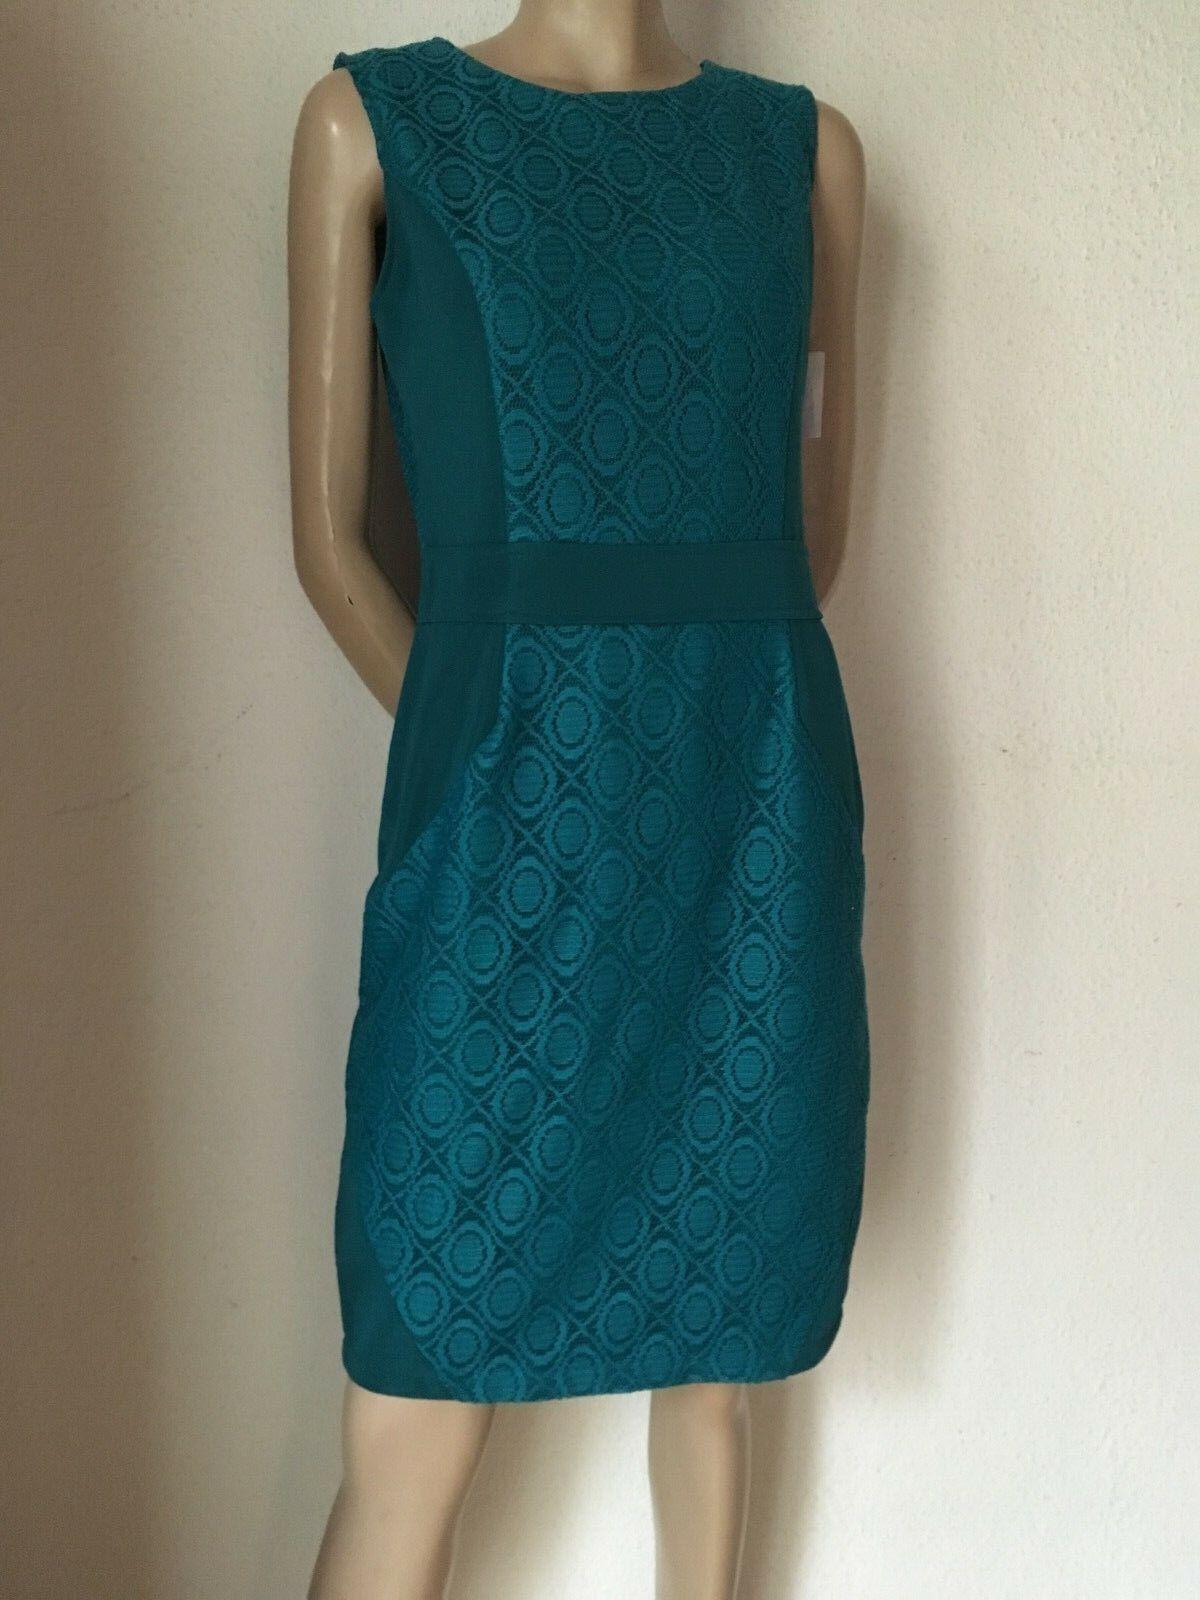 Bleistift Kleid 50er Stil Spitze smaragd grün  38  40 Maiocci VP 299 Euro pin up